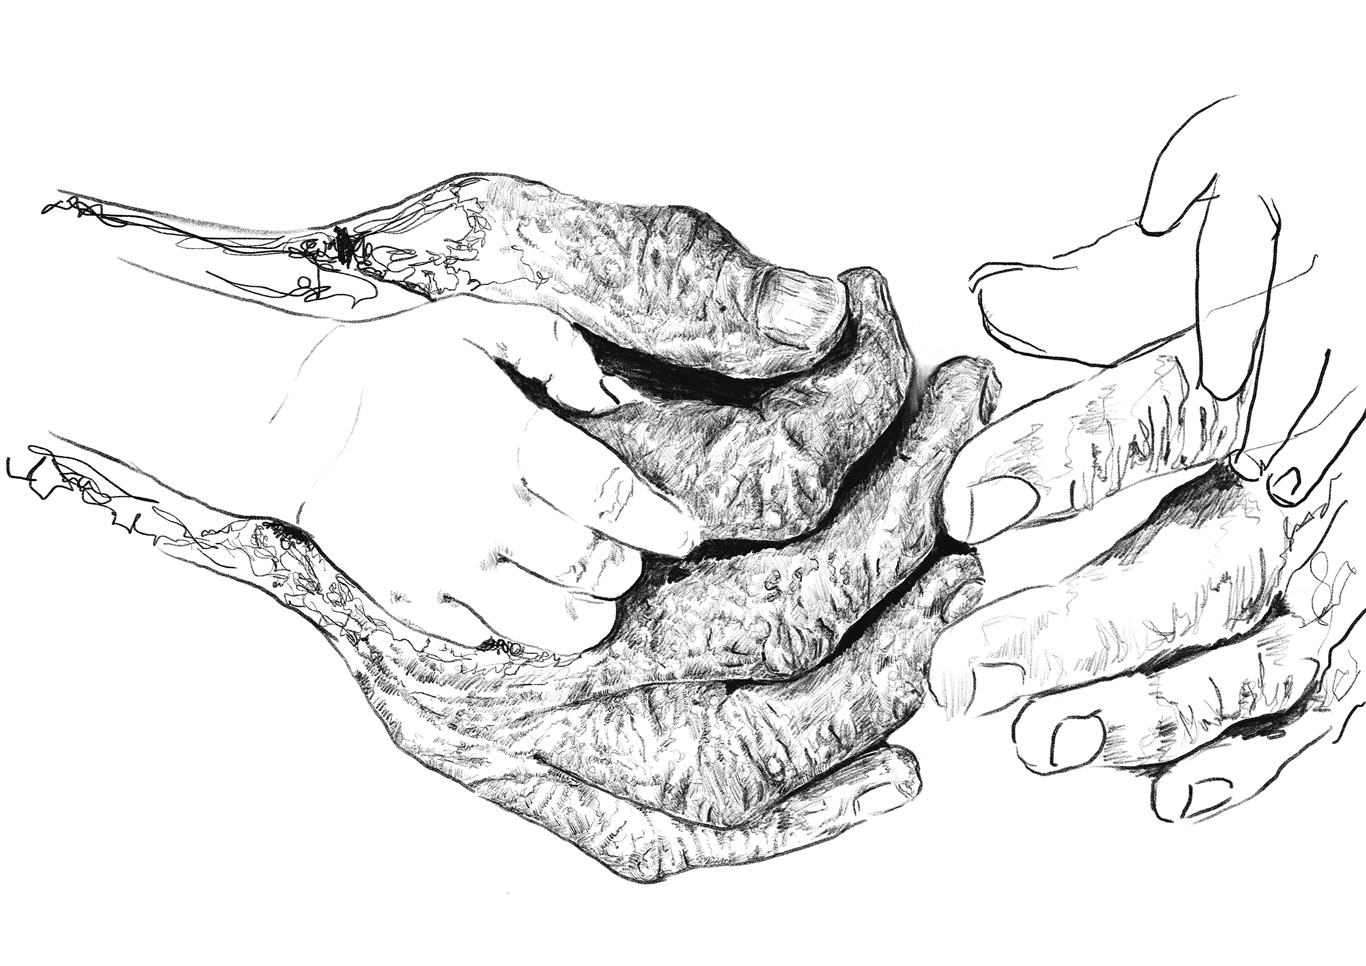 Hand-Study-1.jpg